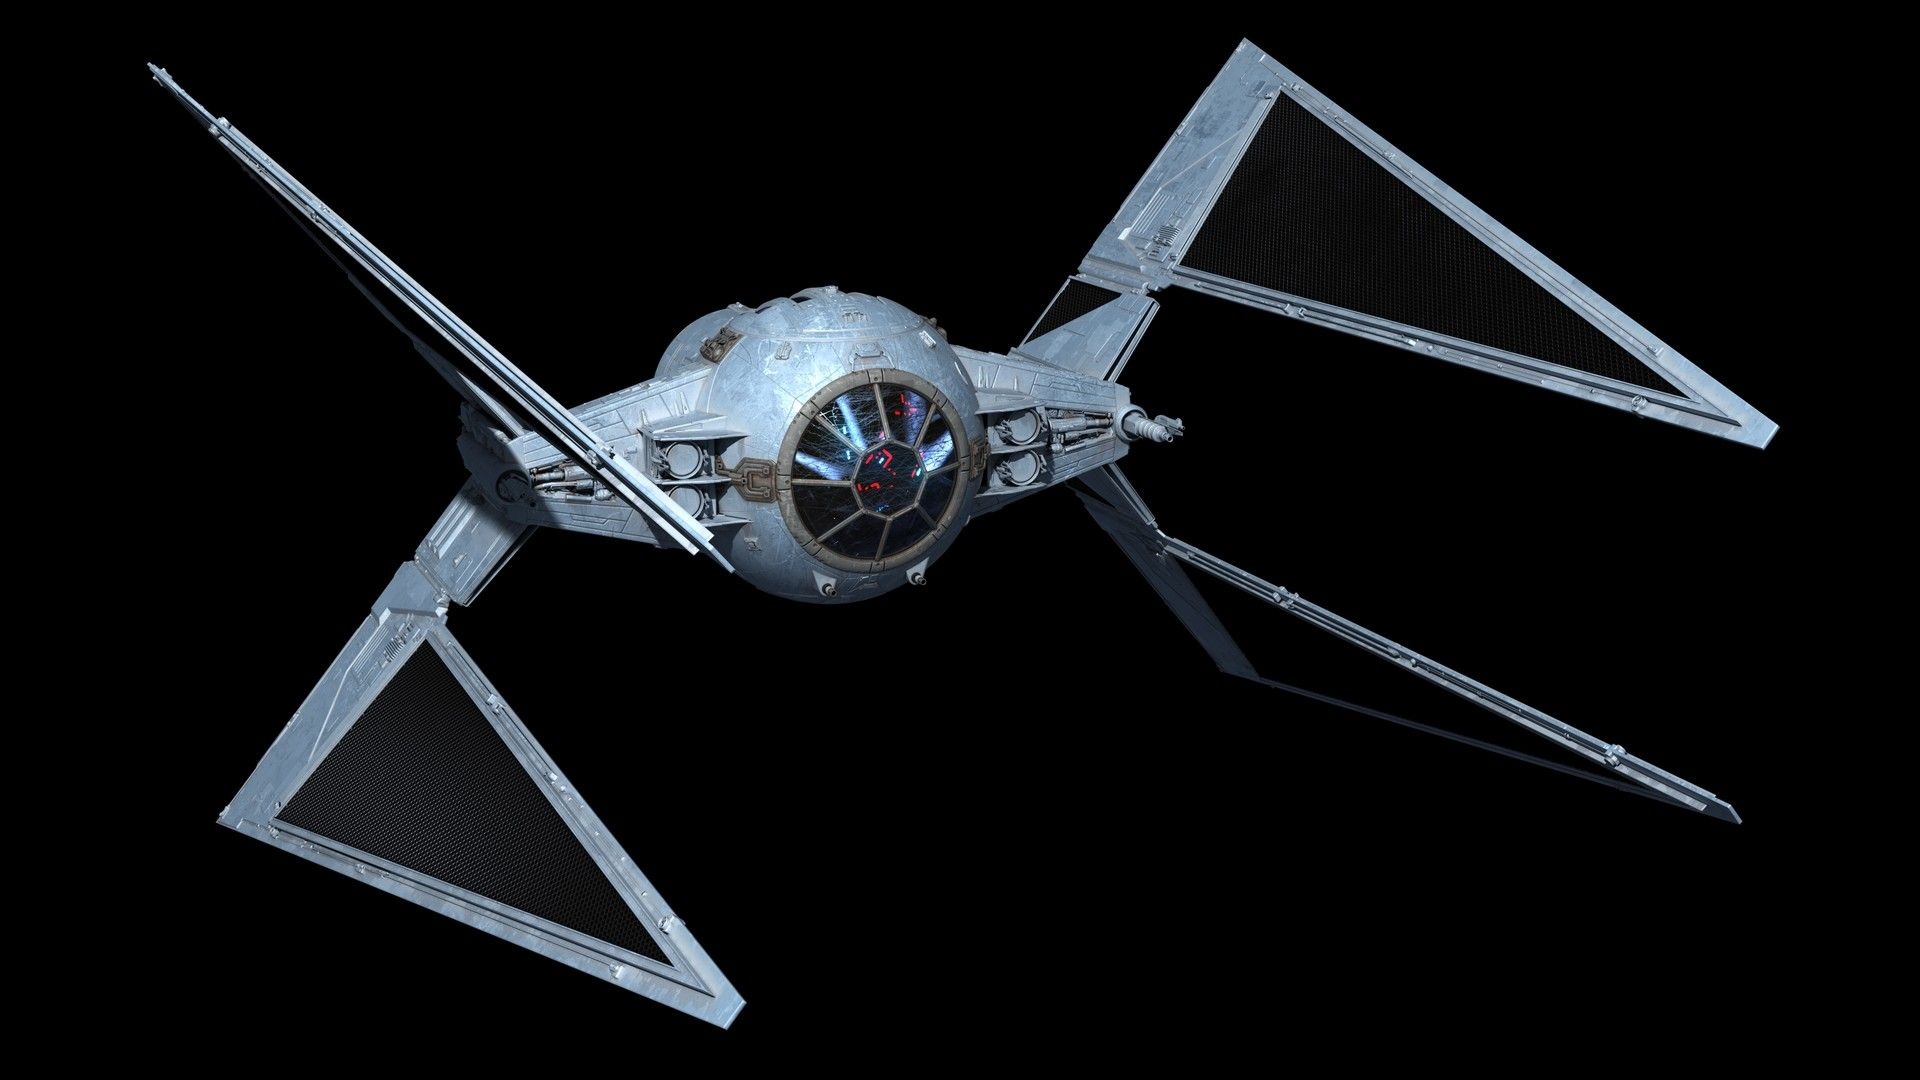 Https Www Artstation Com Artwork 0wbjy Utm Campaign Notify Utm Medium Email Utm Source Notifications Mailer Tie Hunter Star Wars Villains Star Wars Design